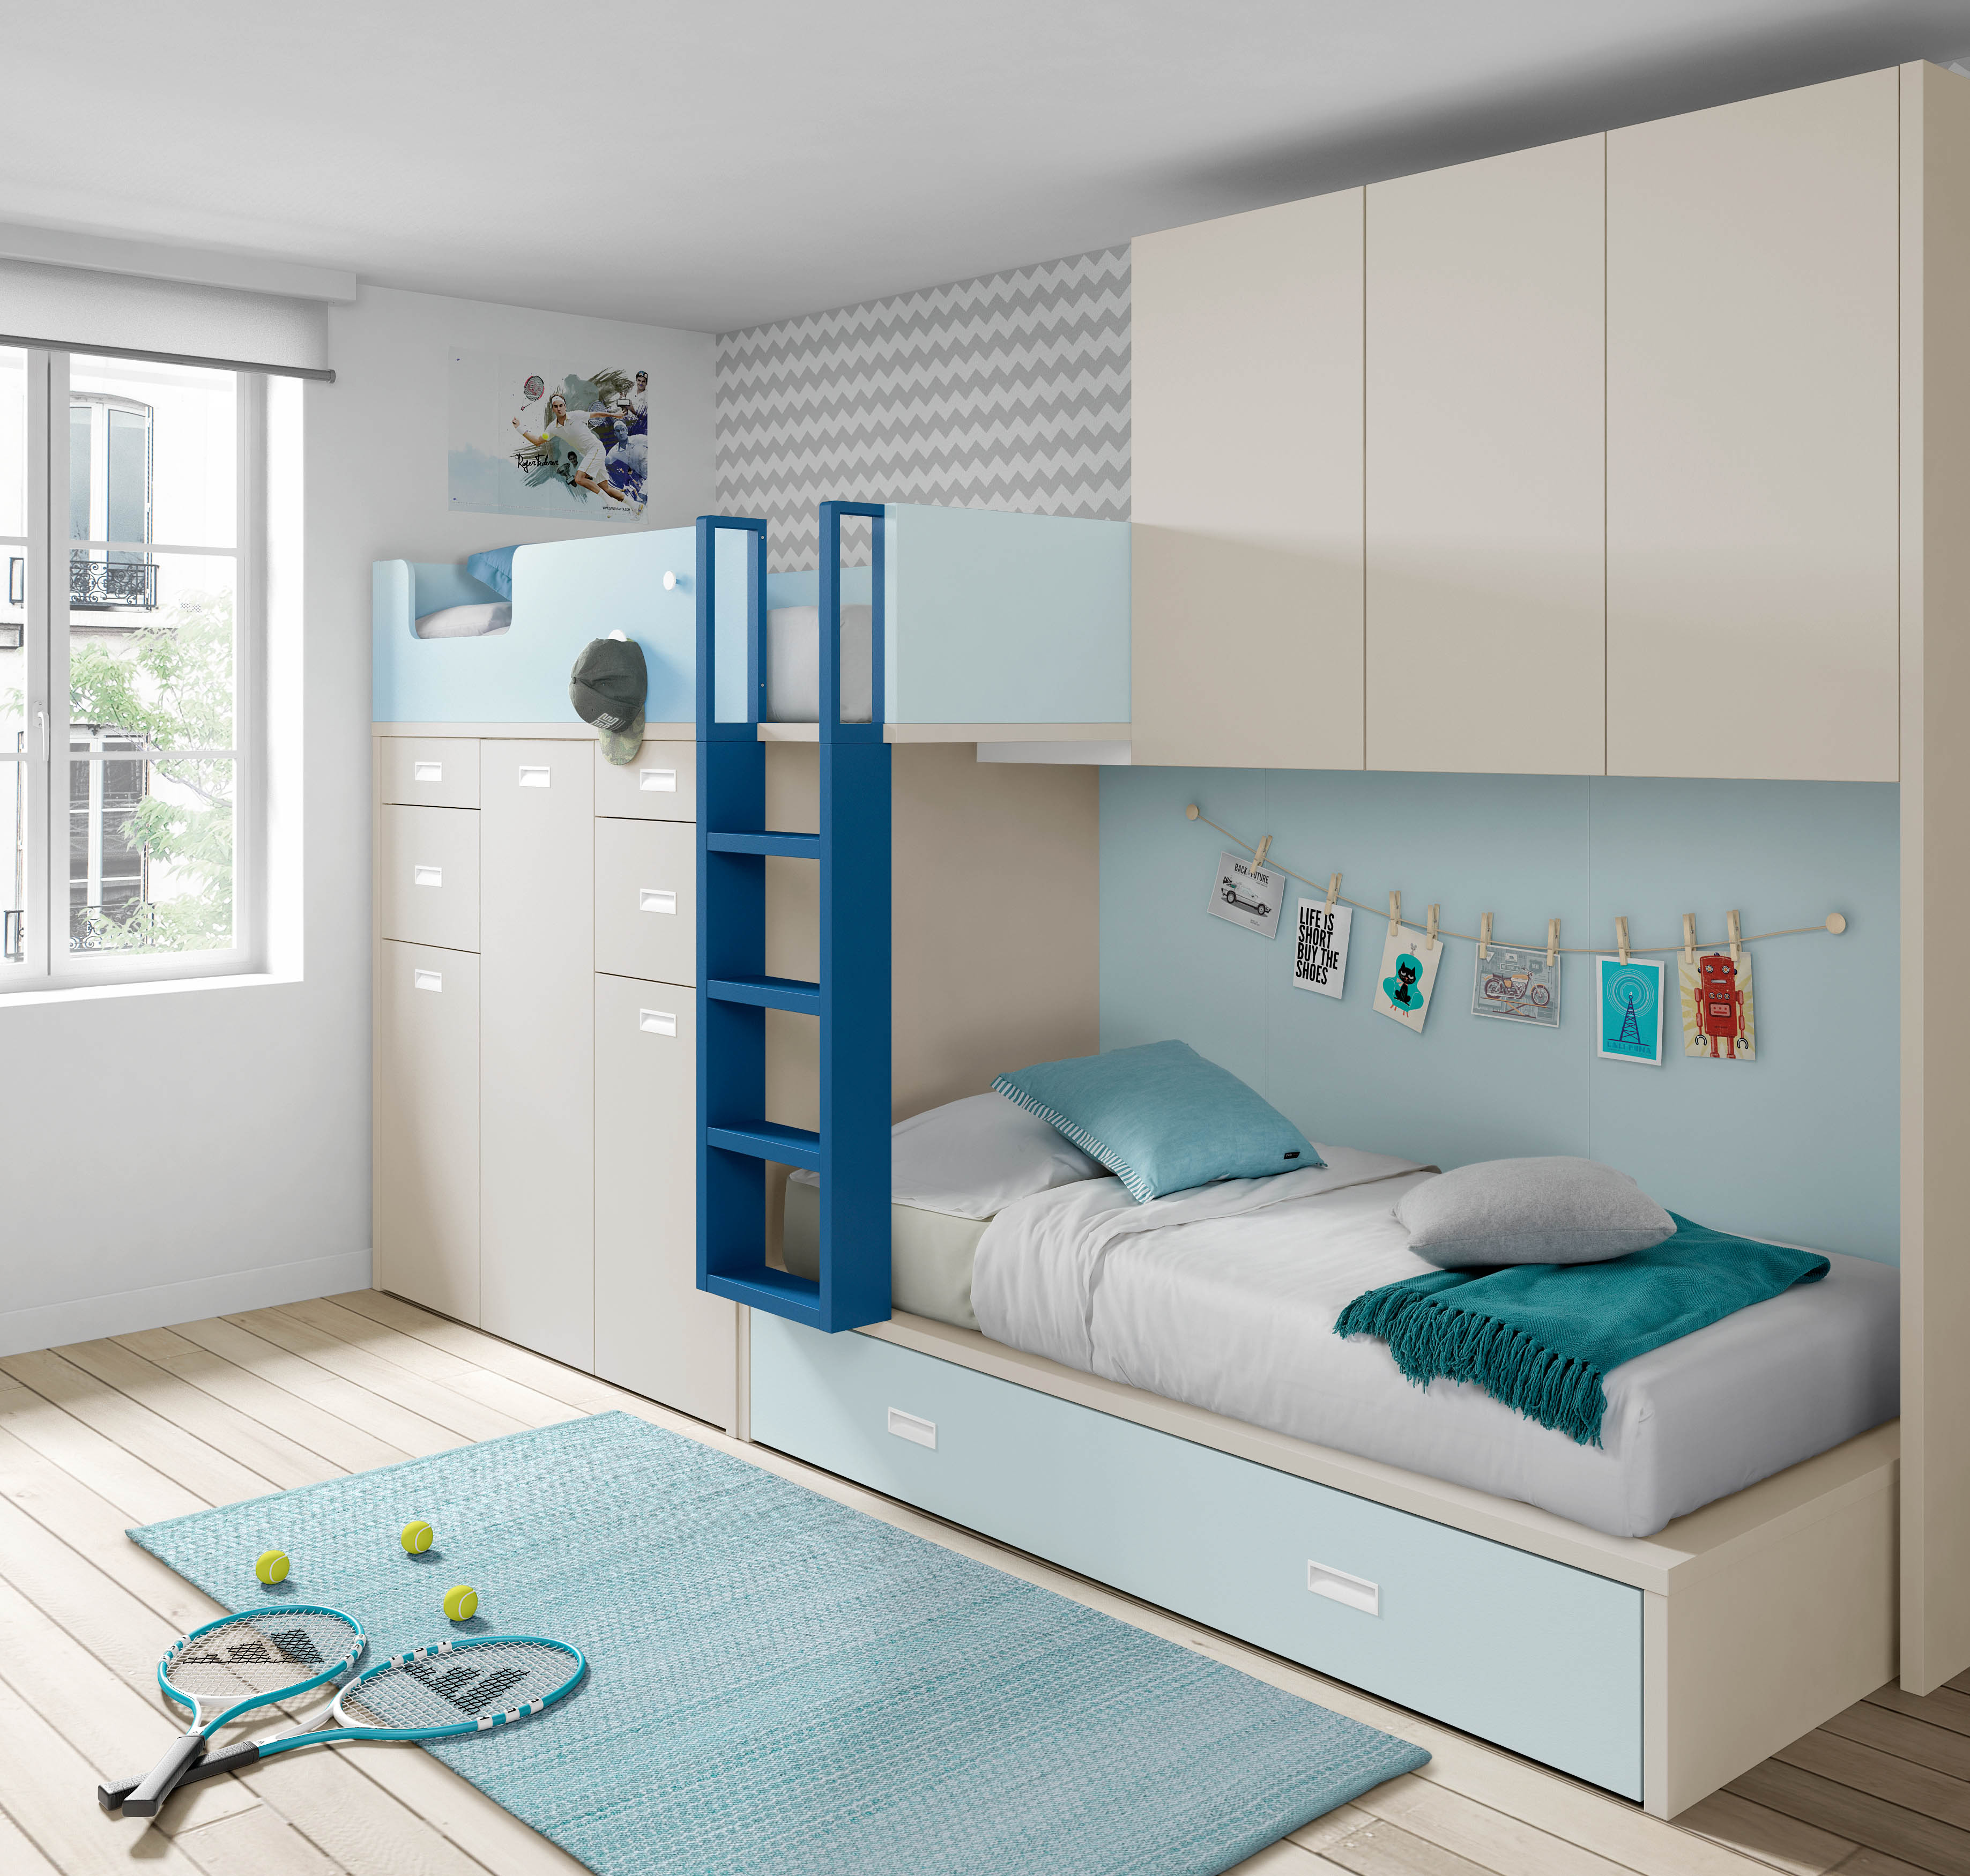 Muebles juveniles cama tren dormitorios juveniles cama for Mueble puente juvenil